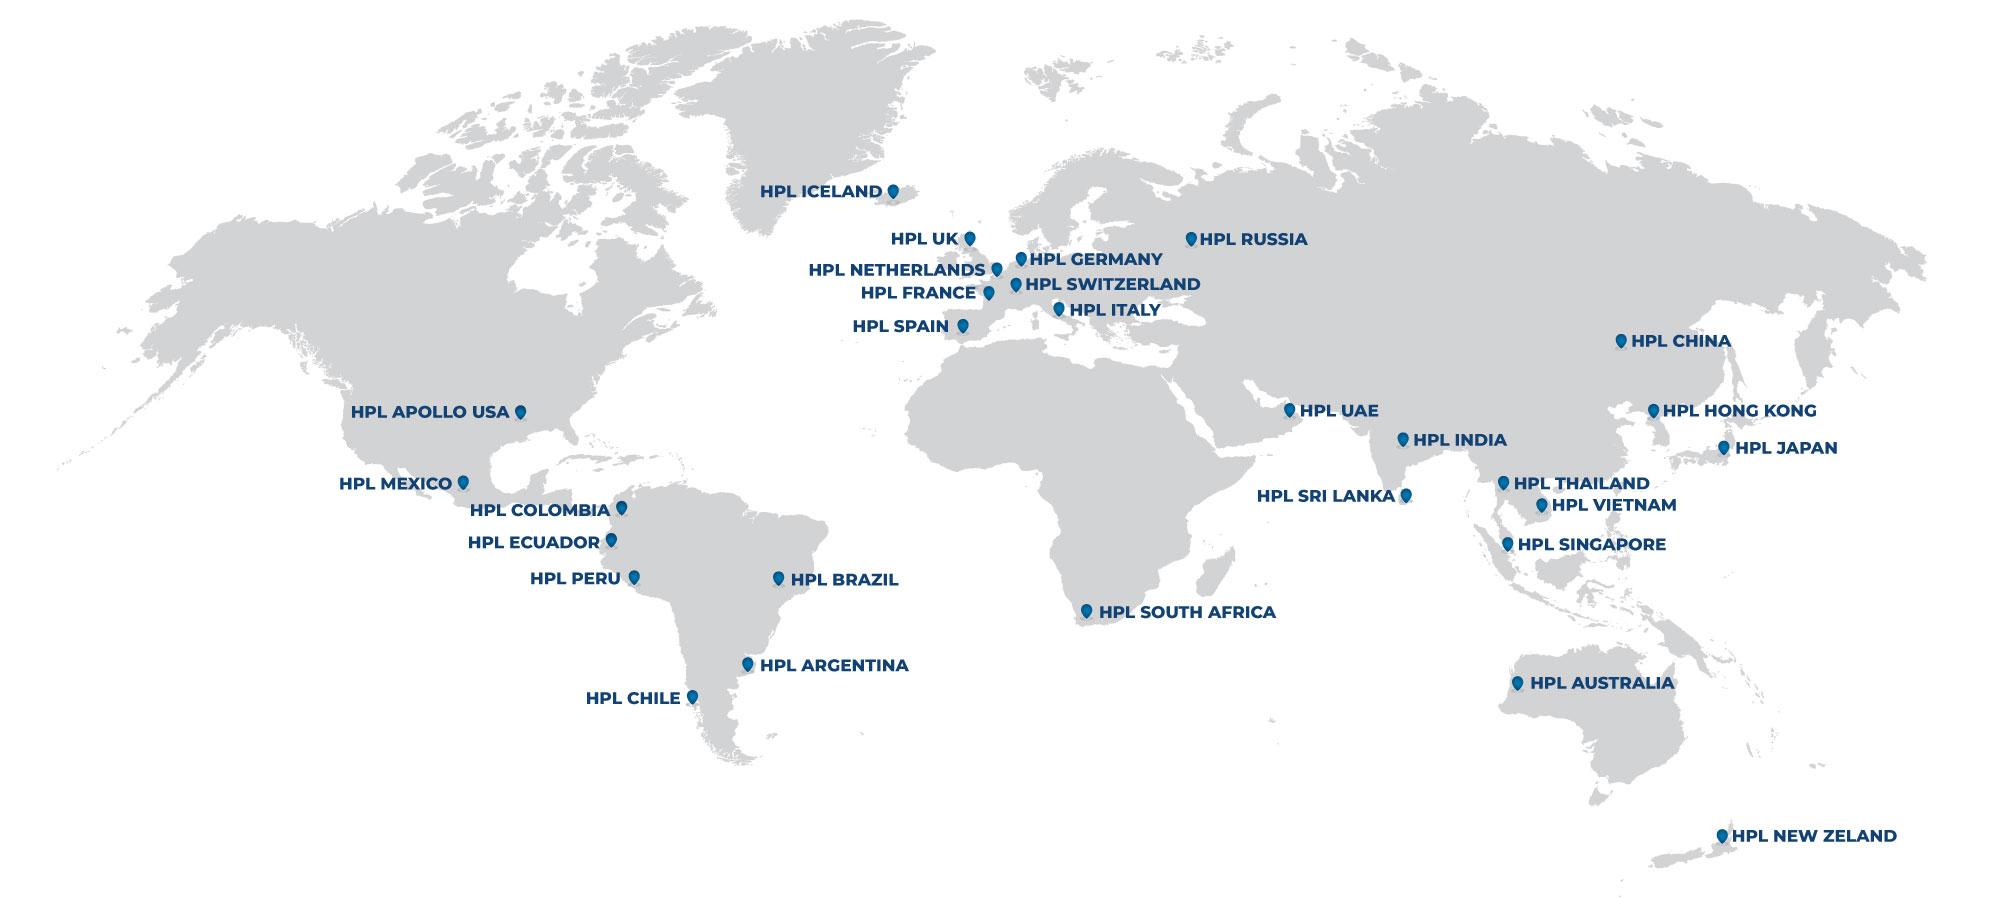 Map of HPL APOLLO locations